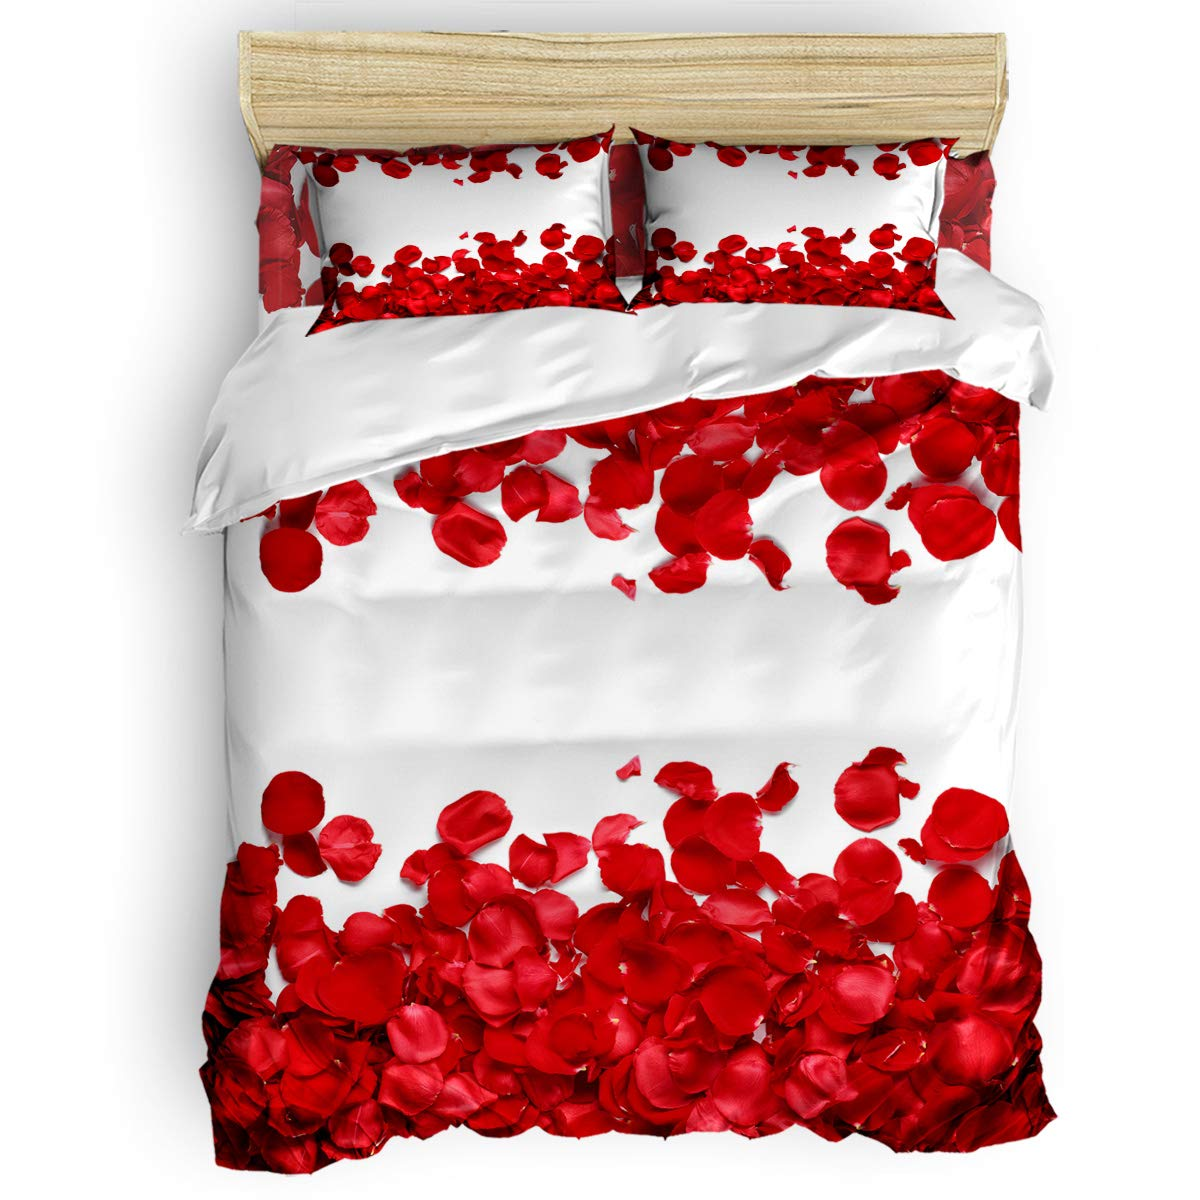 Funy Decor レッドローズ 寝具3点セット 美しい花びらプリント掛け布団カバーセット 掛け布団カバー1枚 枕カバー2枚 子供/子供/ティーン/大人用 クイーン JM-20190319-SJTGDUYSWTQ02024SJTCTBD B07Q2T72ZM Valentines Red Rose Petal6246-3 Pcs クイーン